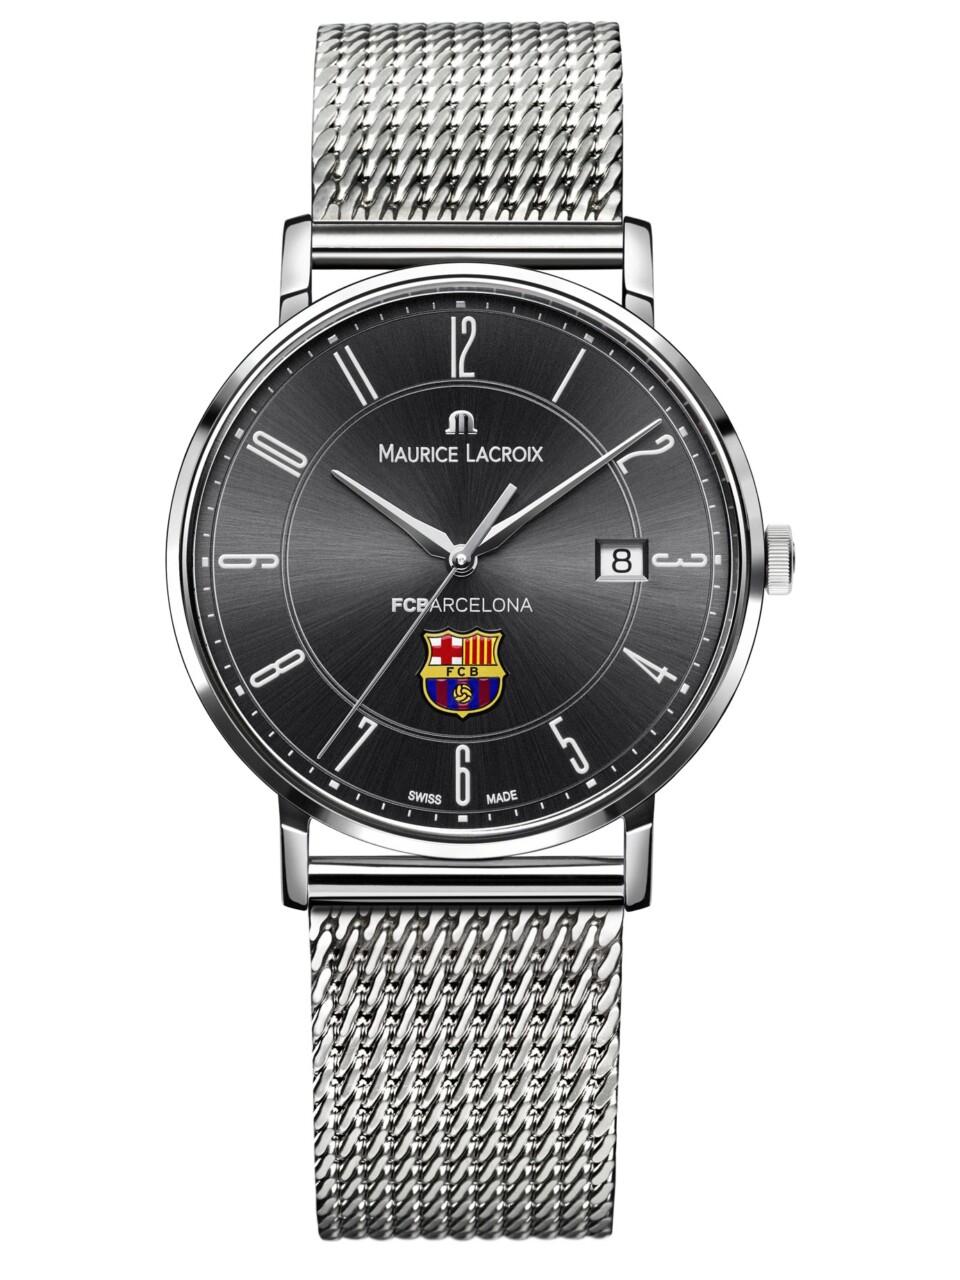 Maurice Lacroix Eliros FC Barcelona EL1087SS0023201 1